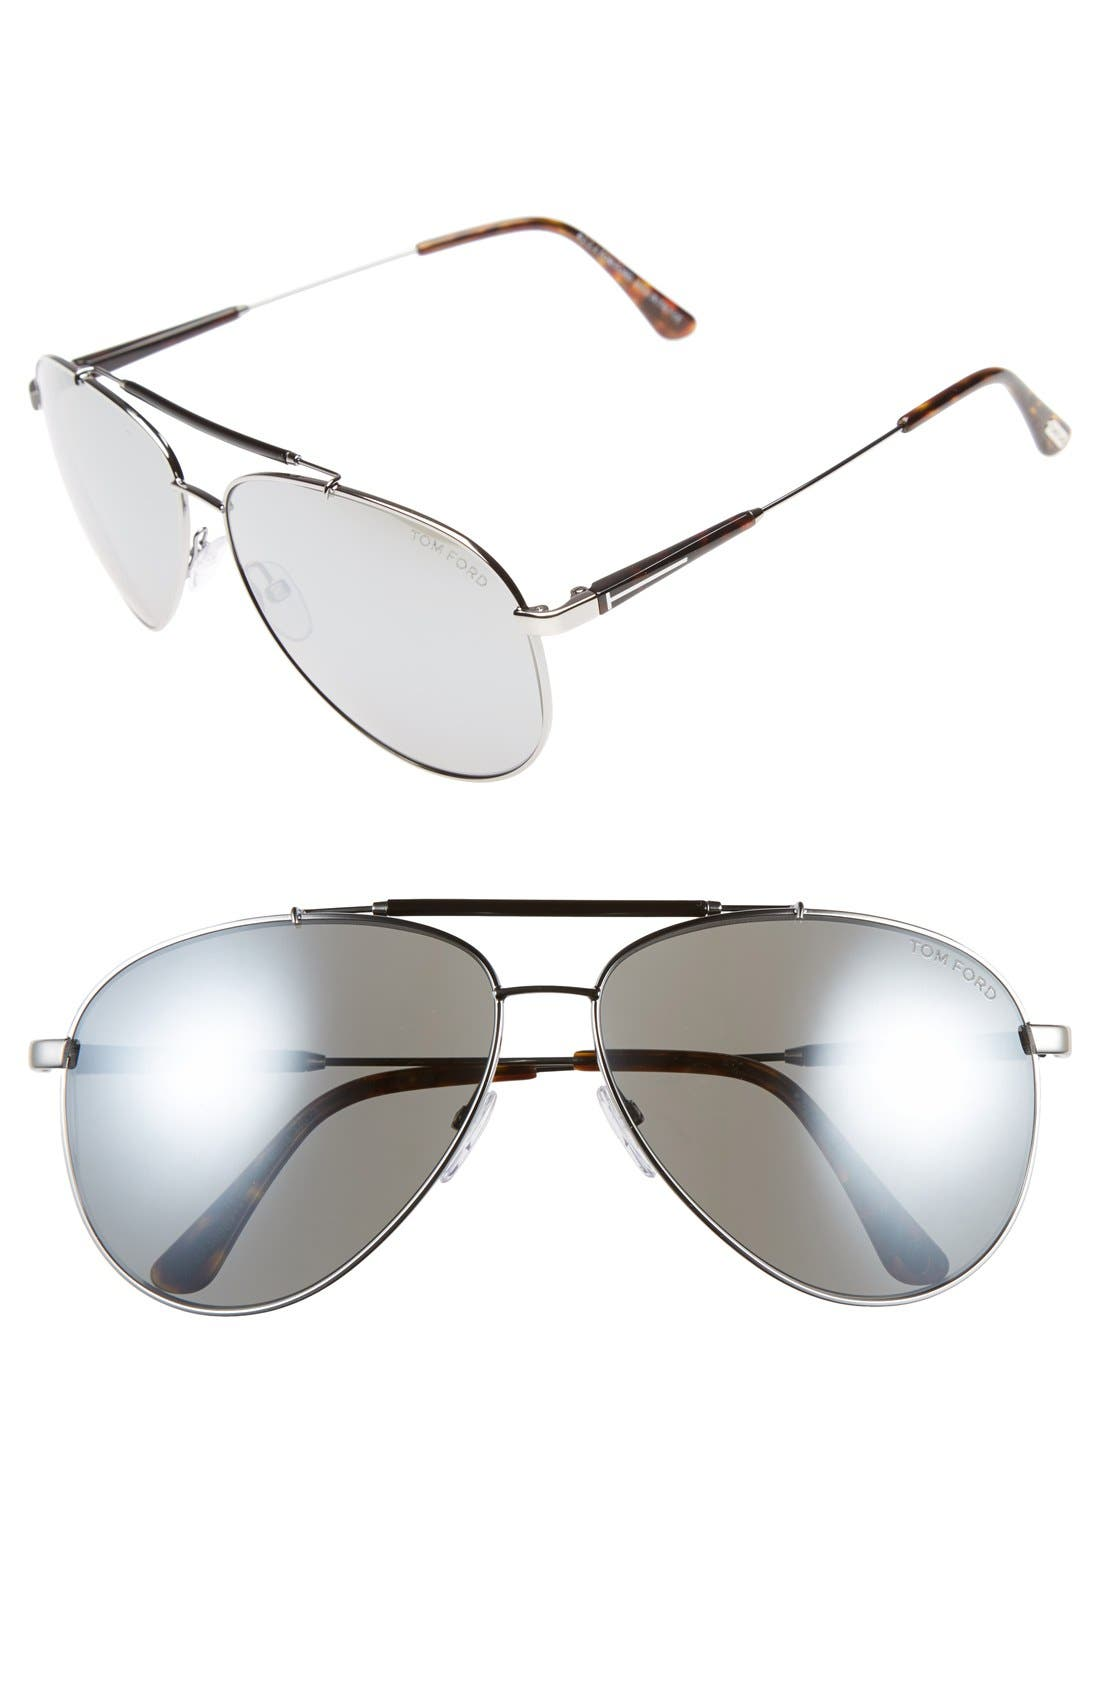 Rick 62mm Aviator Sunglasses,                             Main thumbnail 1, color,